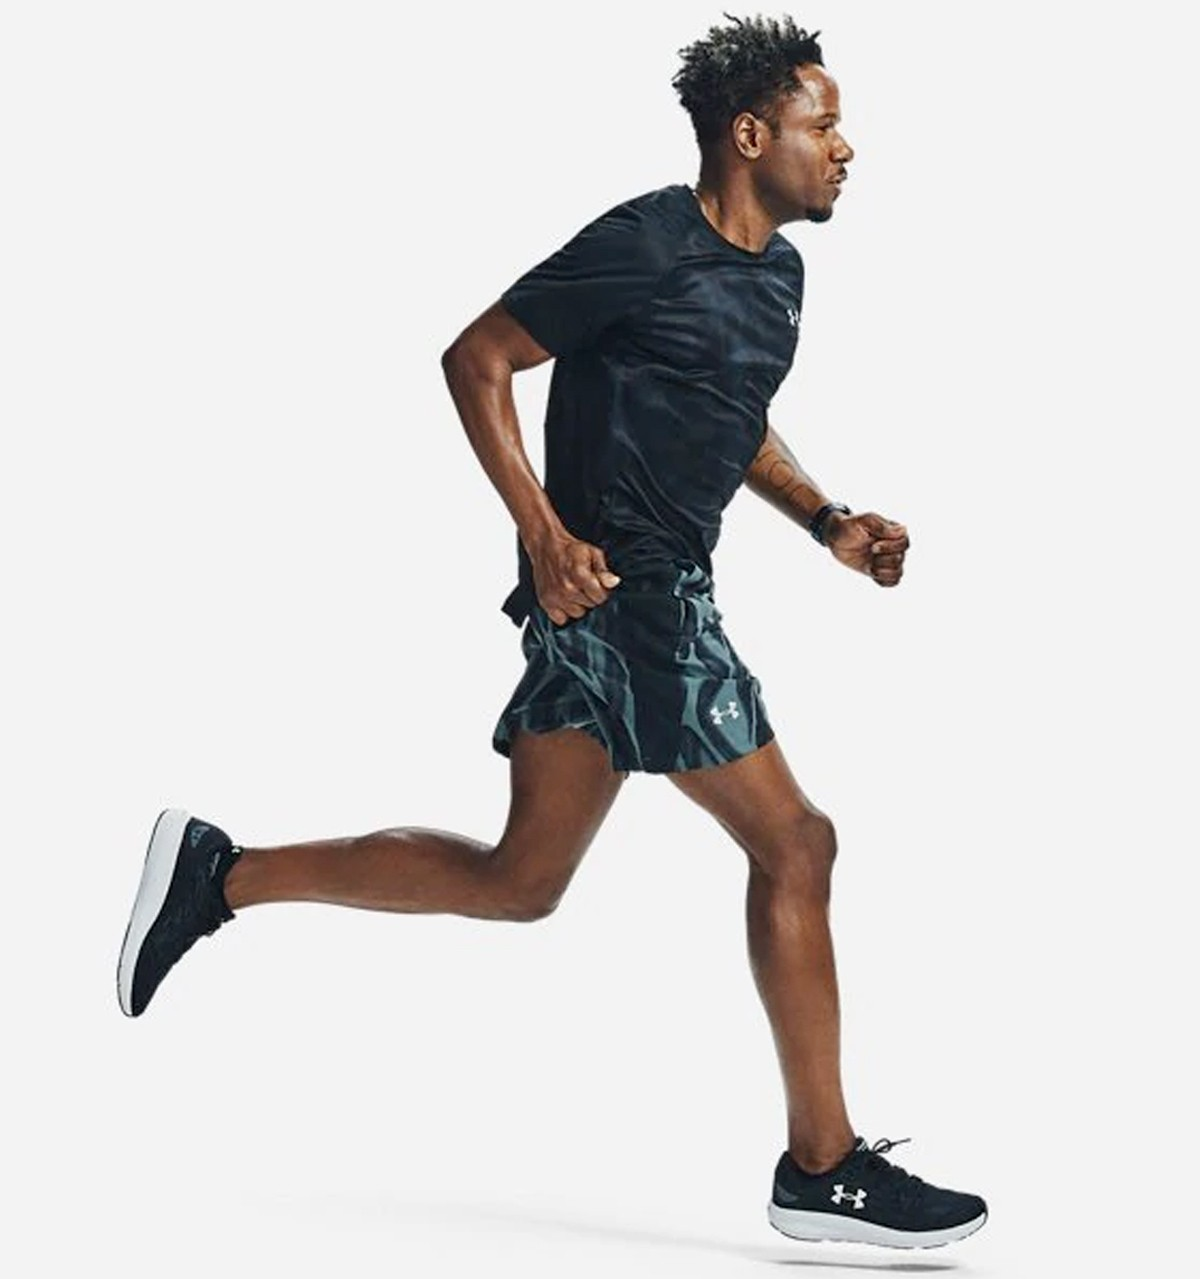 Under Armour Charged Pursuit 2, zapatilla de running para corredores neutros - foto 4